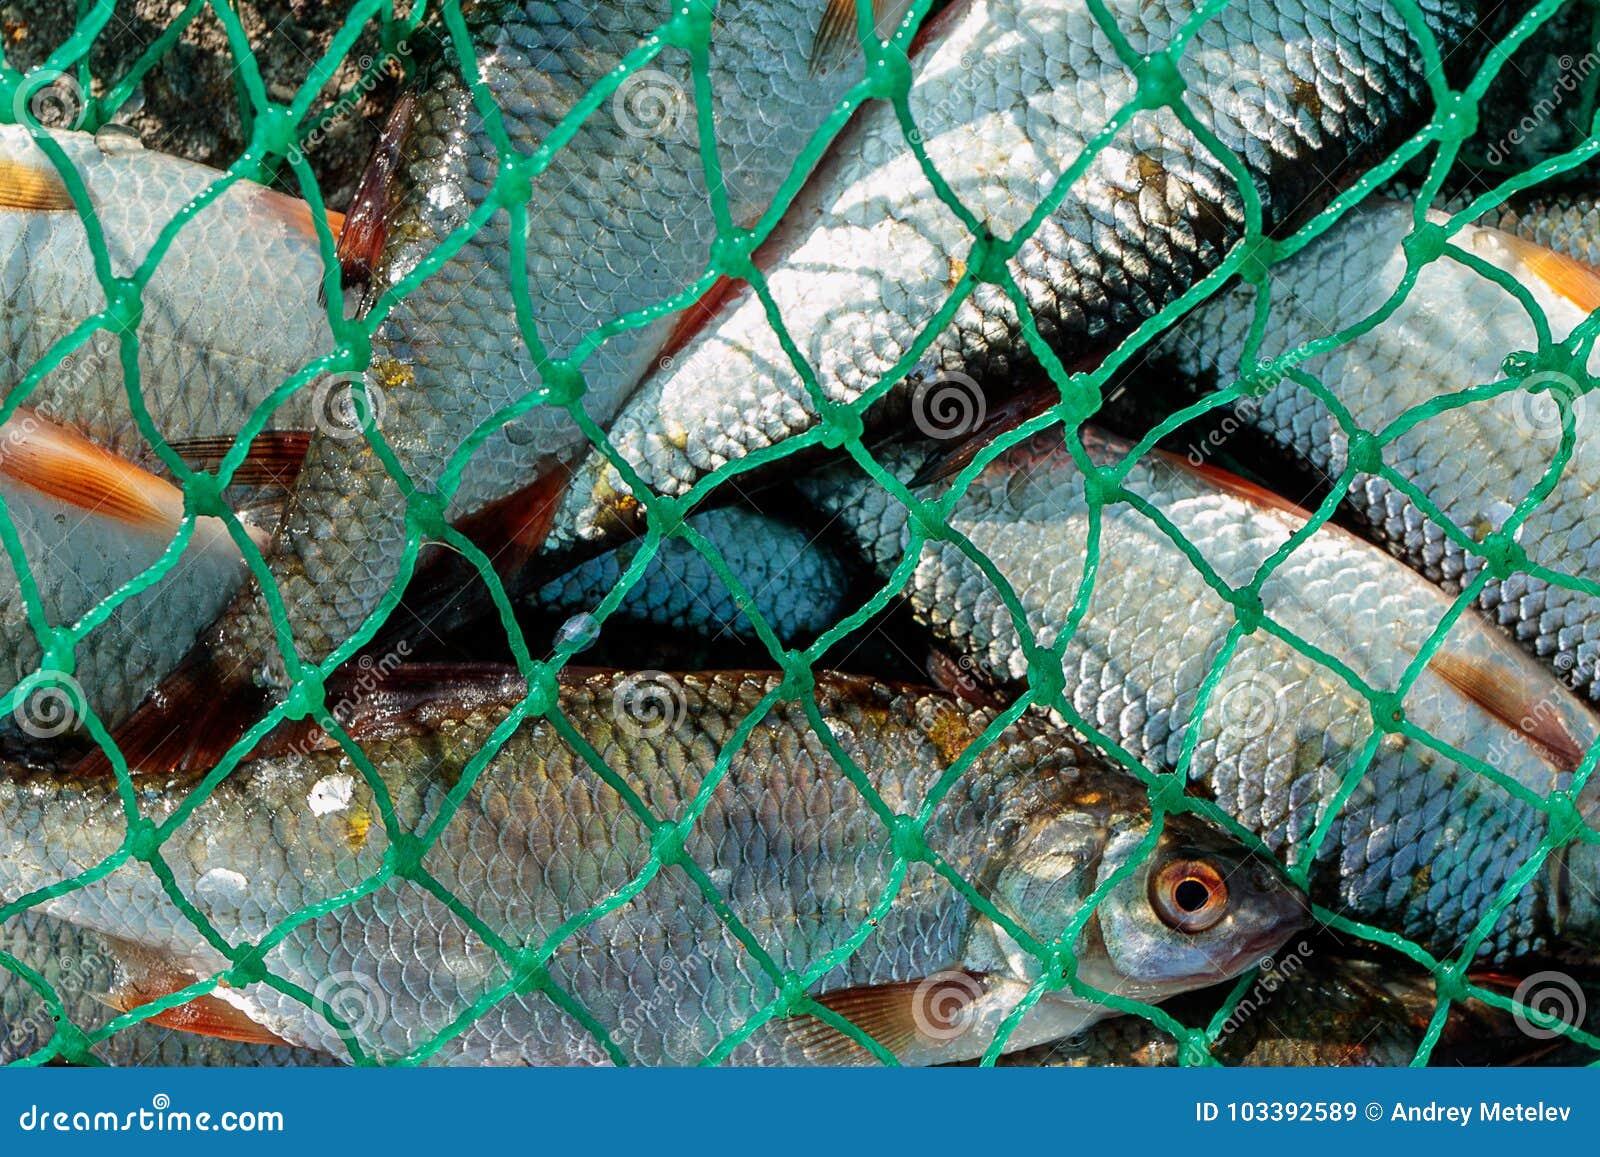 plenty of fish is it free